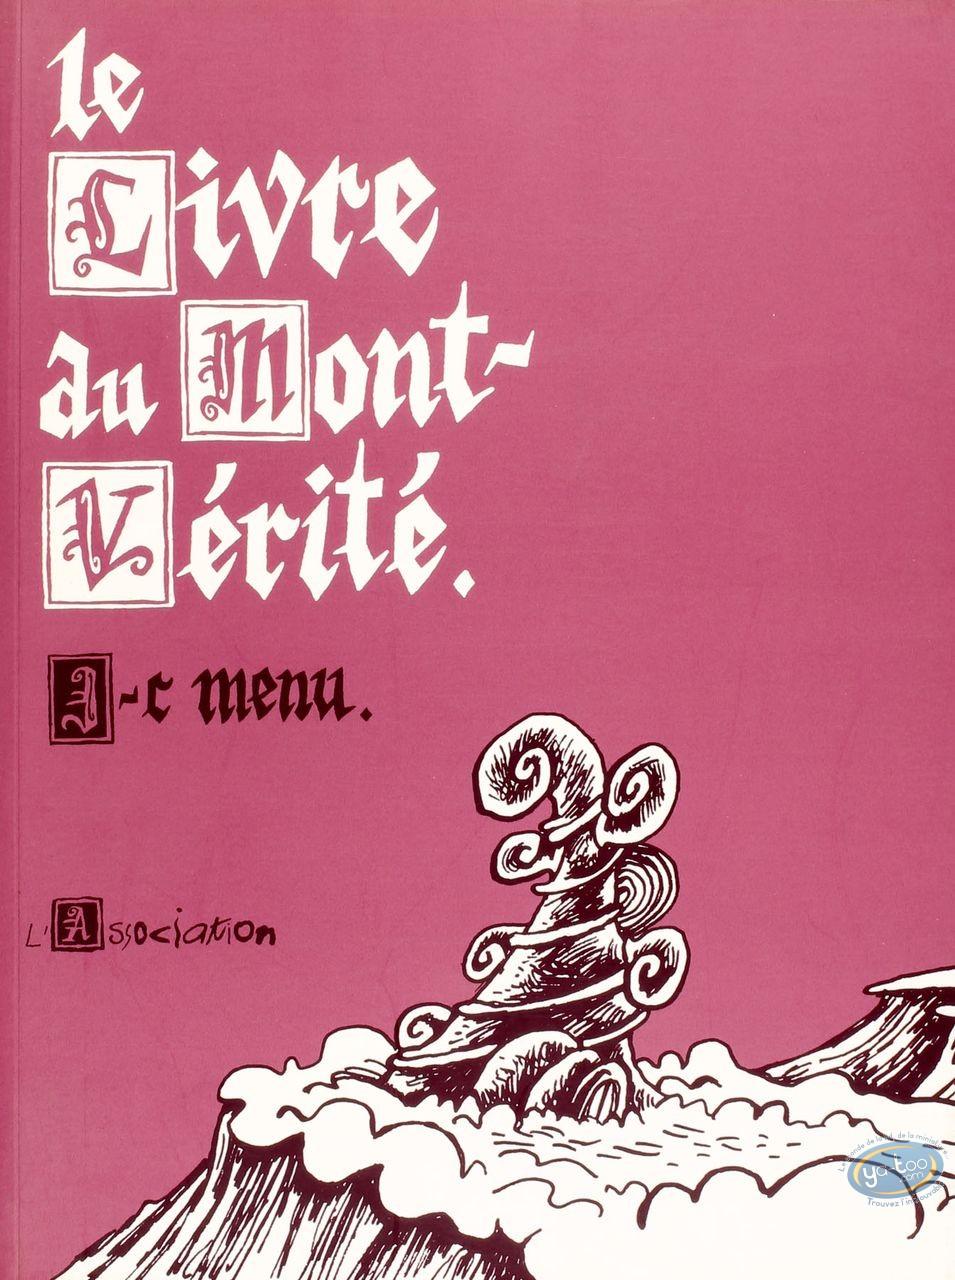 Listed European Comic Books, Livre du Mont-Vérité : Le Livre du Mont-Vérité